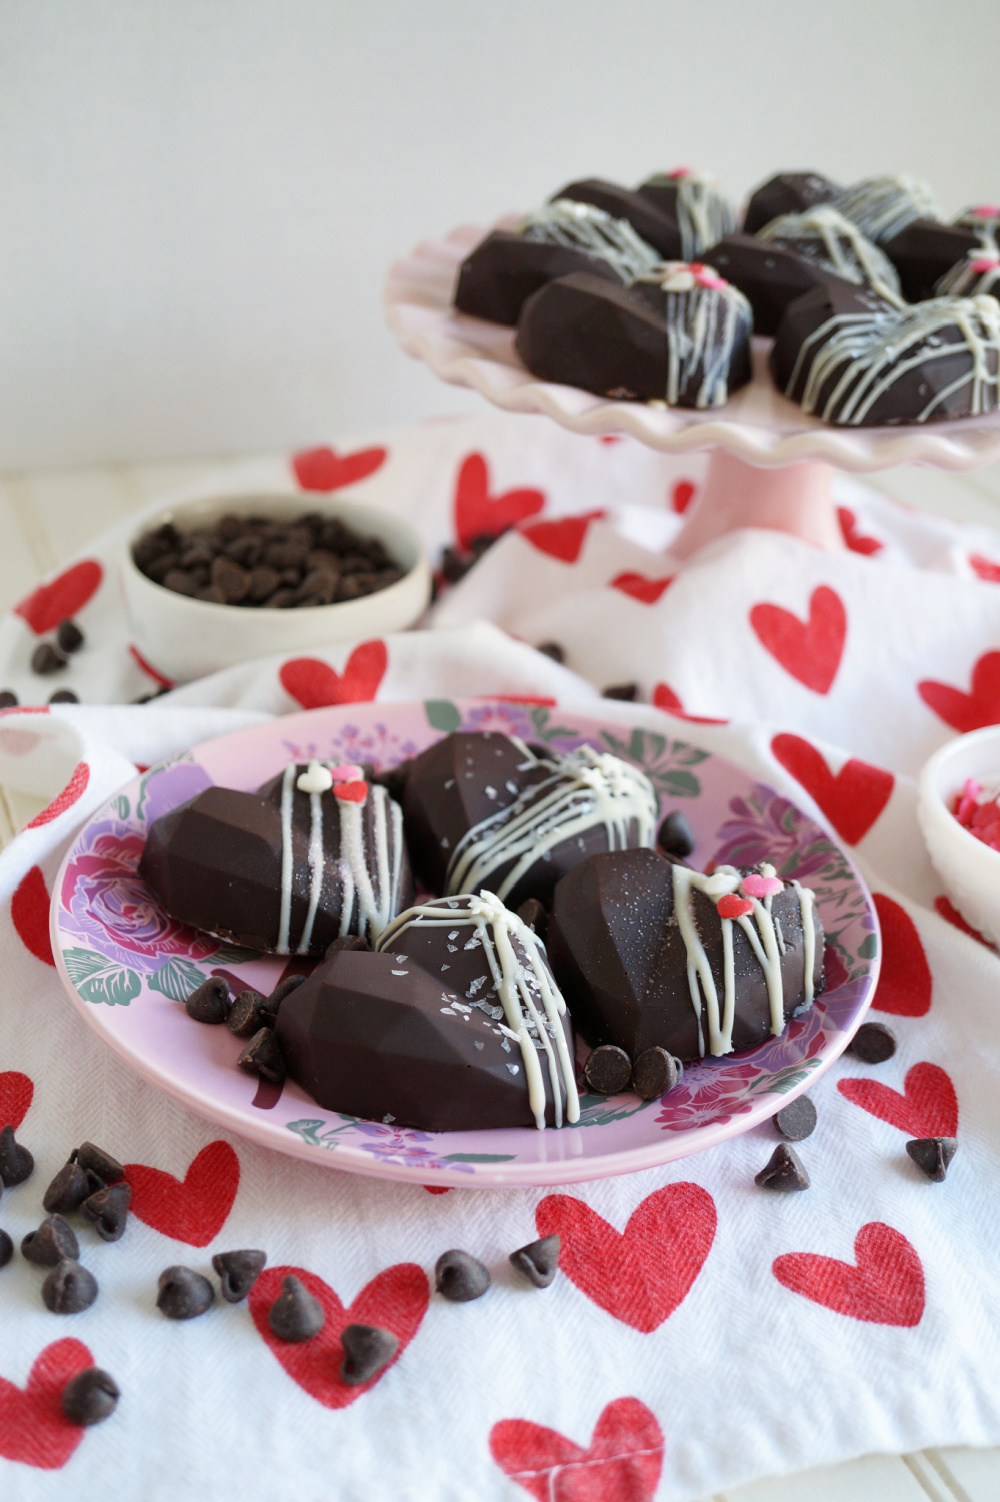 plate of heart shaped chocolate cake gems